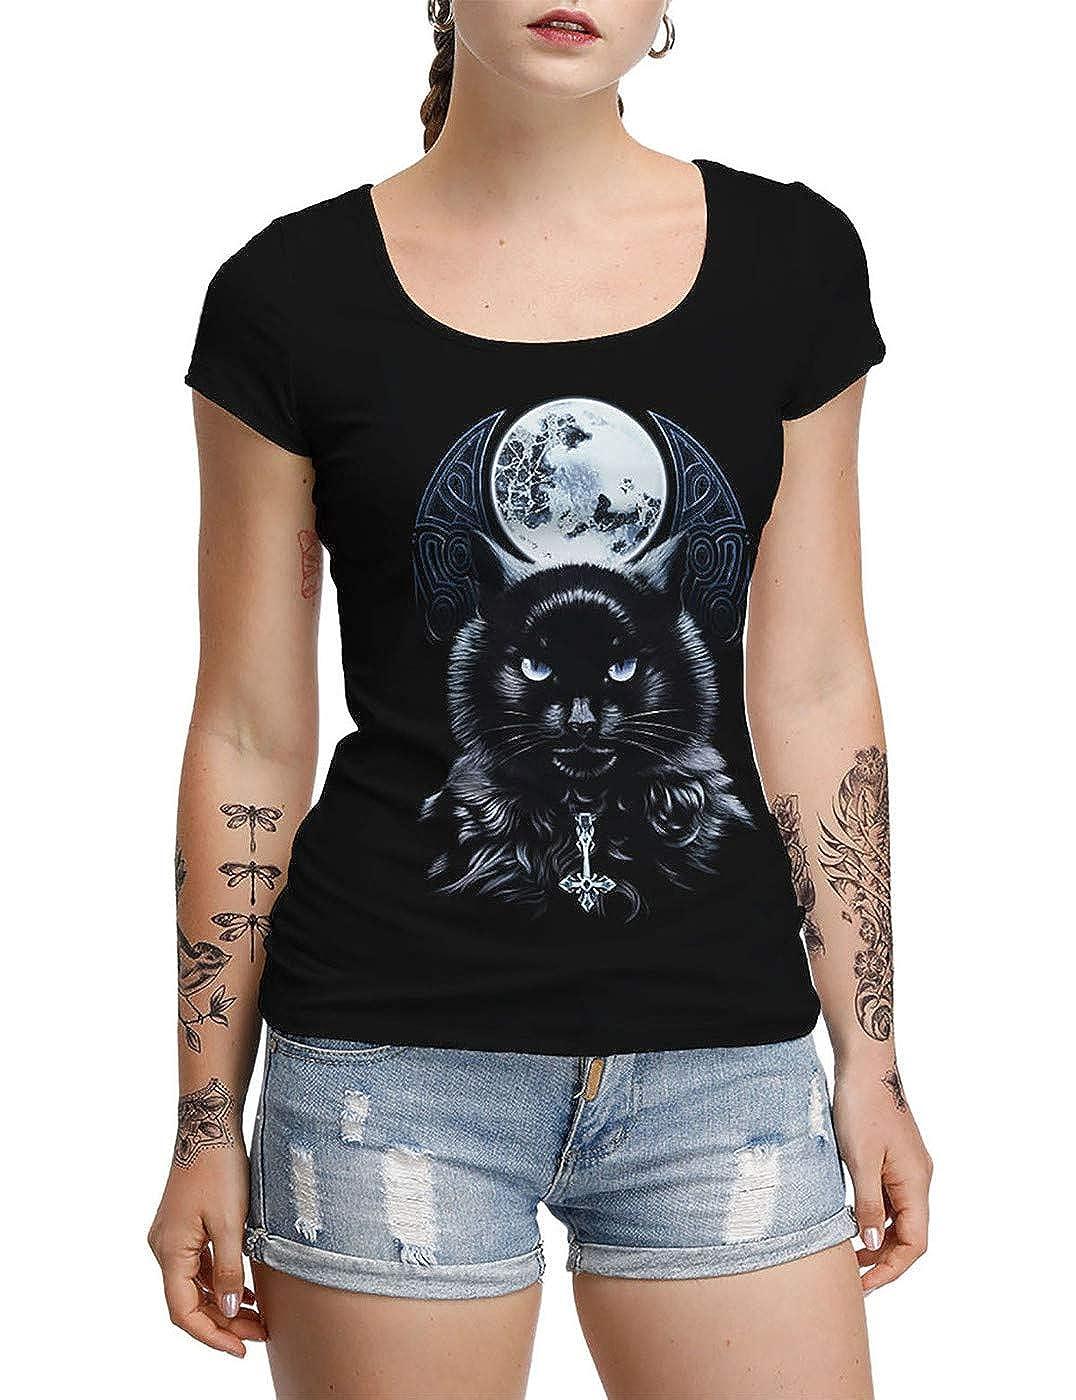 Donna Halloween Maglietta Cool Cranio T-Shirt Halloween Costumi Zucca Shirt Nero Top Tomba Hollow Indietro T-Shirt Elastico novit/à Moda Costumi per Festa Parata